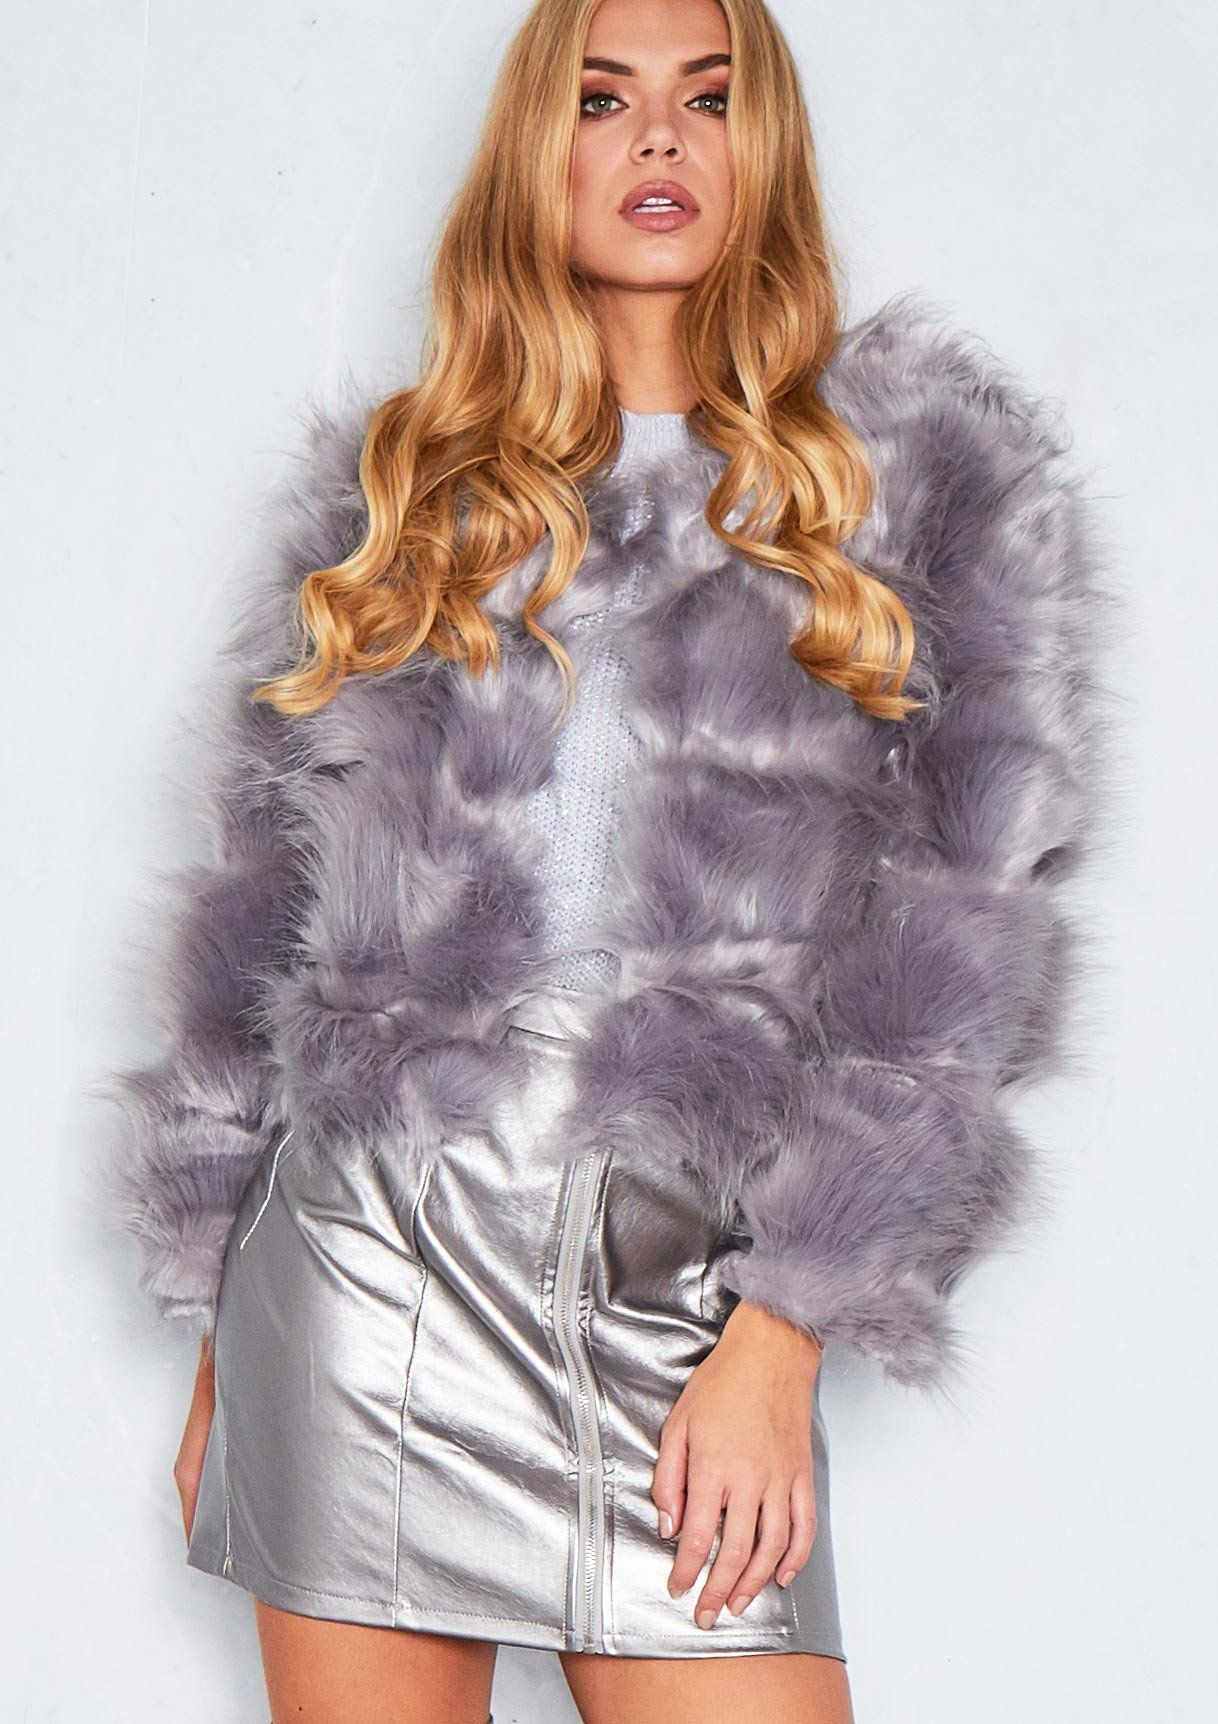 24aaa7a3477 Aniyah Grey Cropped Shaggy Faux Fur Coat | Irina v. Ray STYLE | Fur ...